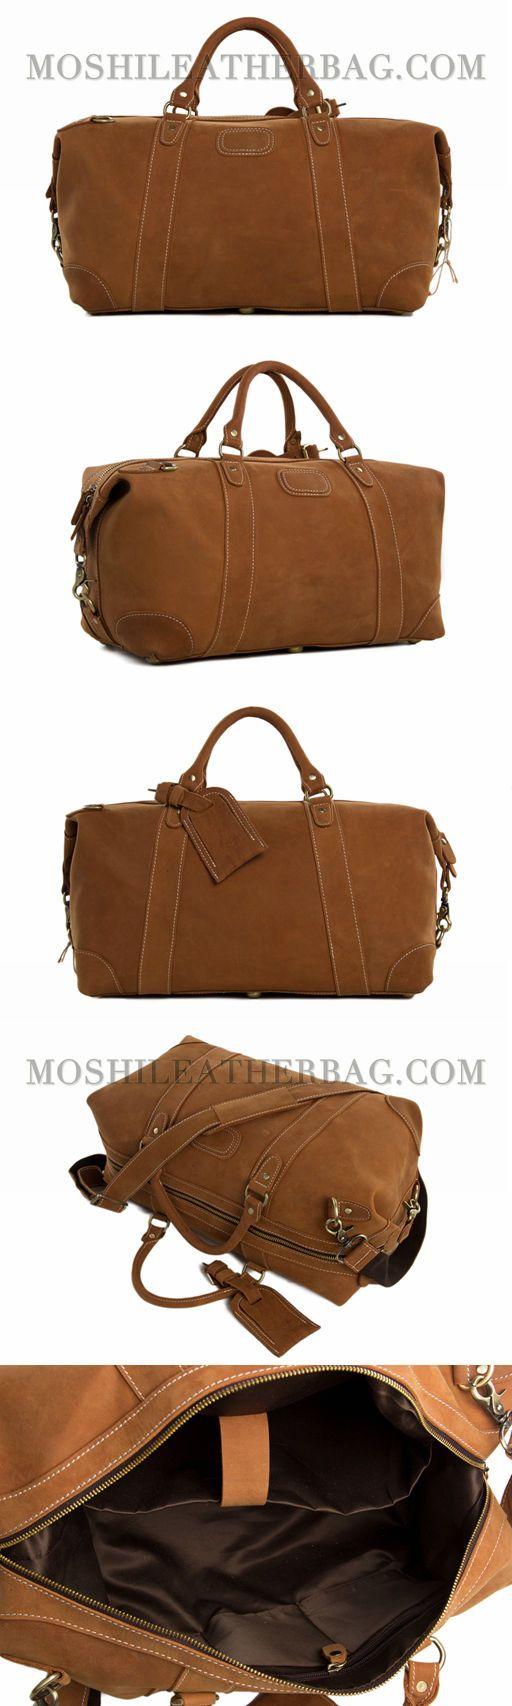 Handcrafted Genuine Leather Travel Bag, Duffle Bag, Overnight Bag, Weekender Bag DZ02